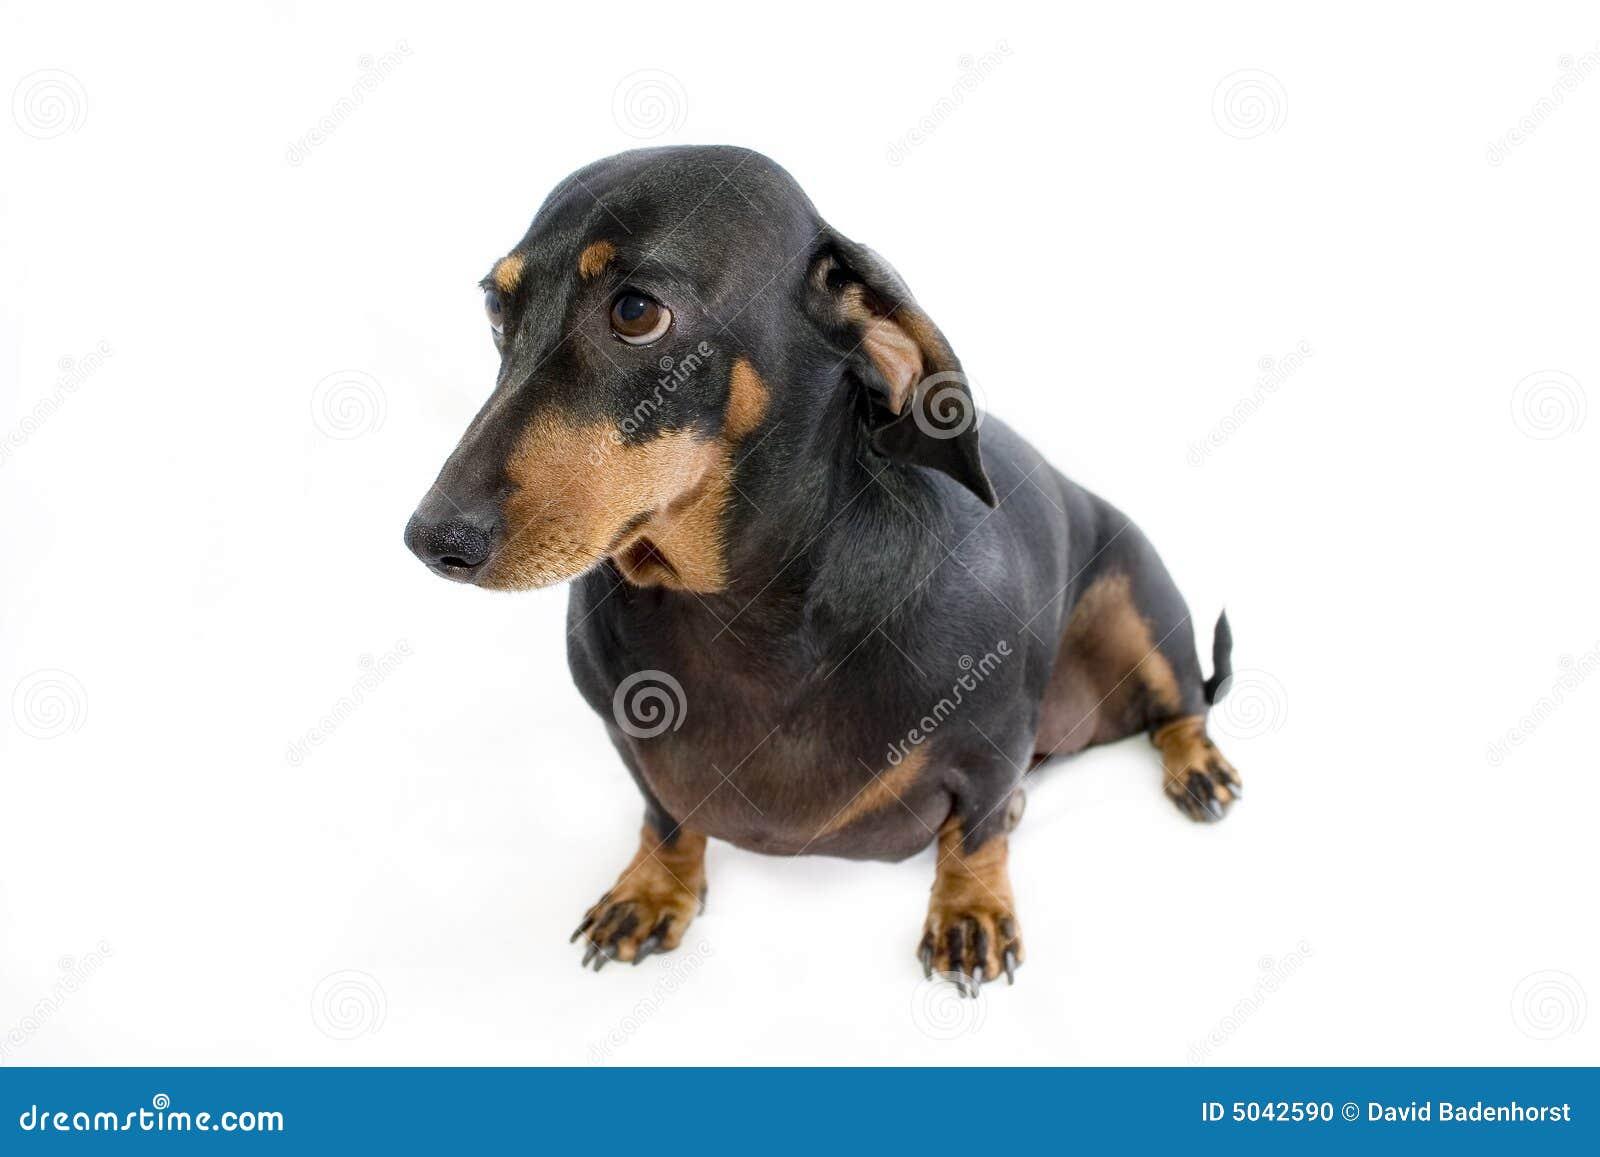 Black Dachshund Dogs